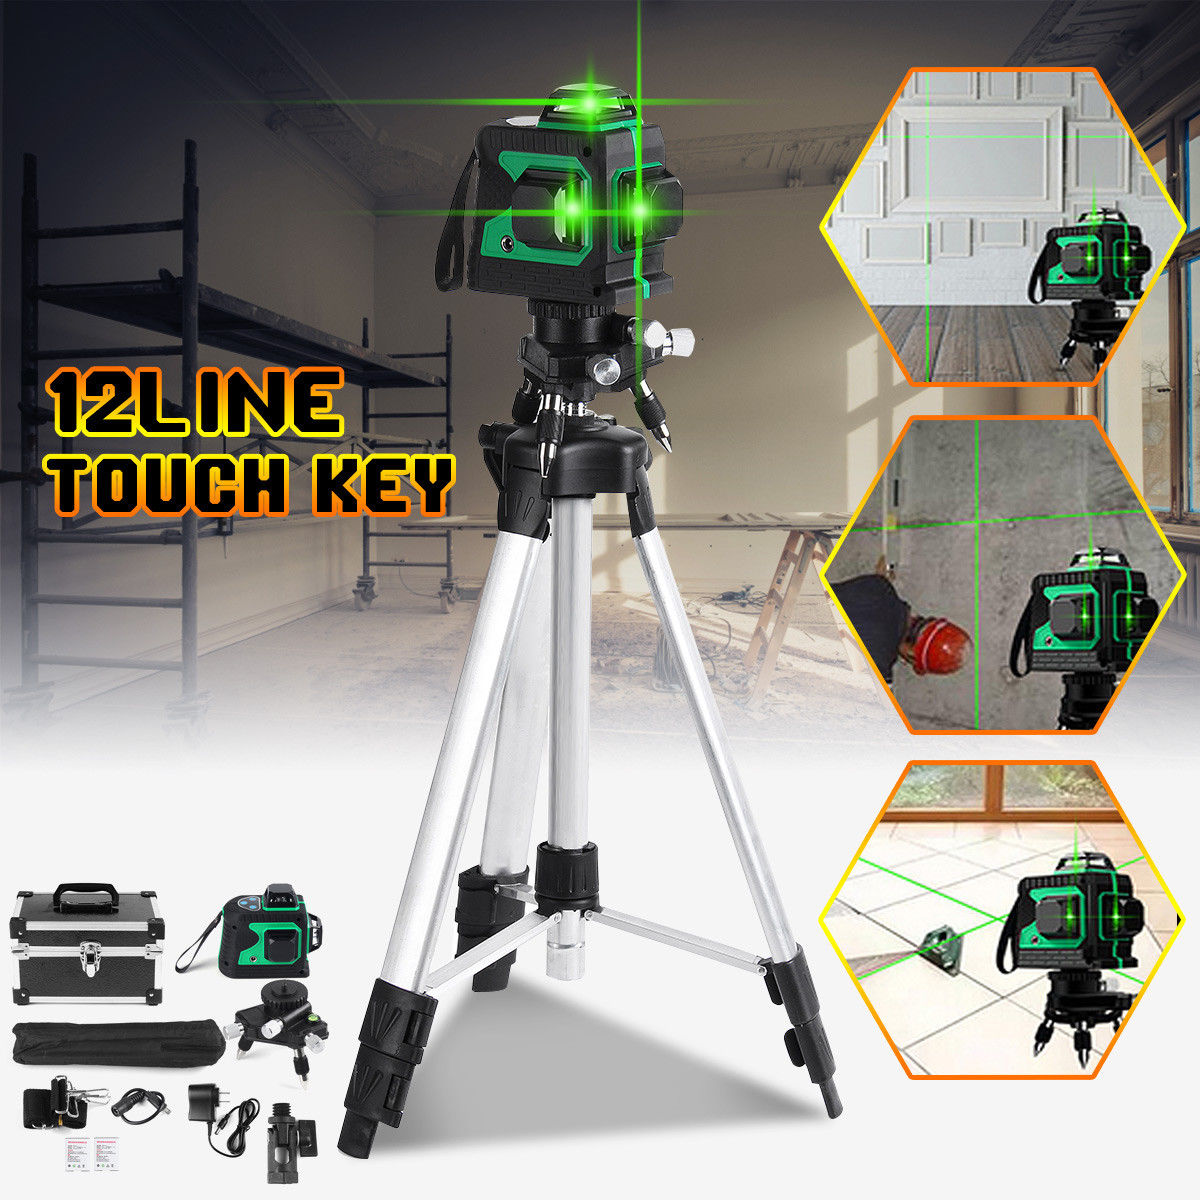 12 Line 3D Green Laser Level Self 360Rotaty Outdoor Receiver Leveling Vertical Horizontal Cross Level Multi Slash Function multi function green